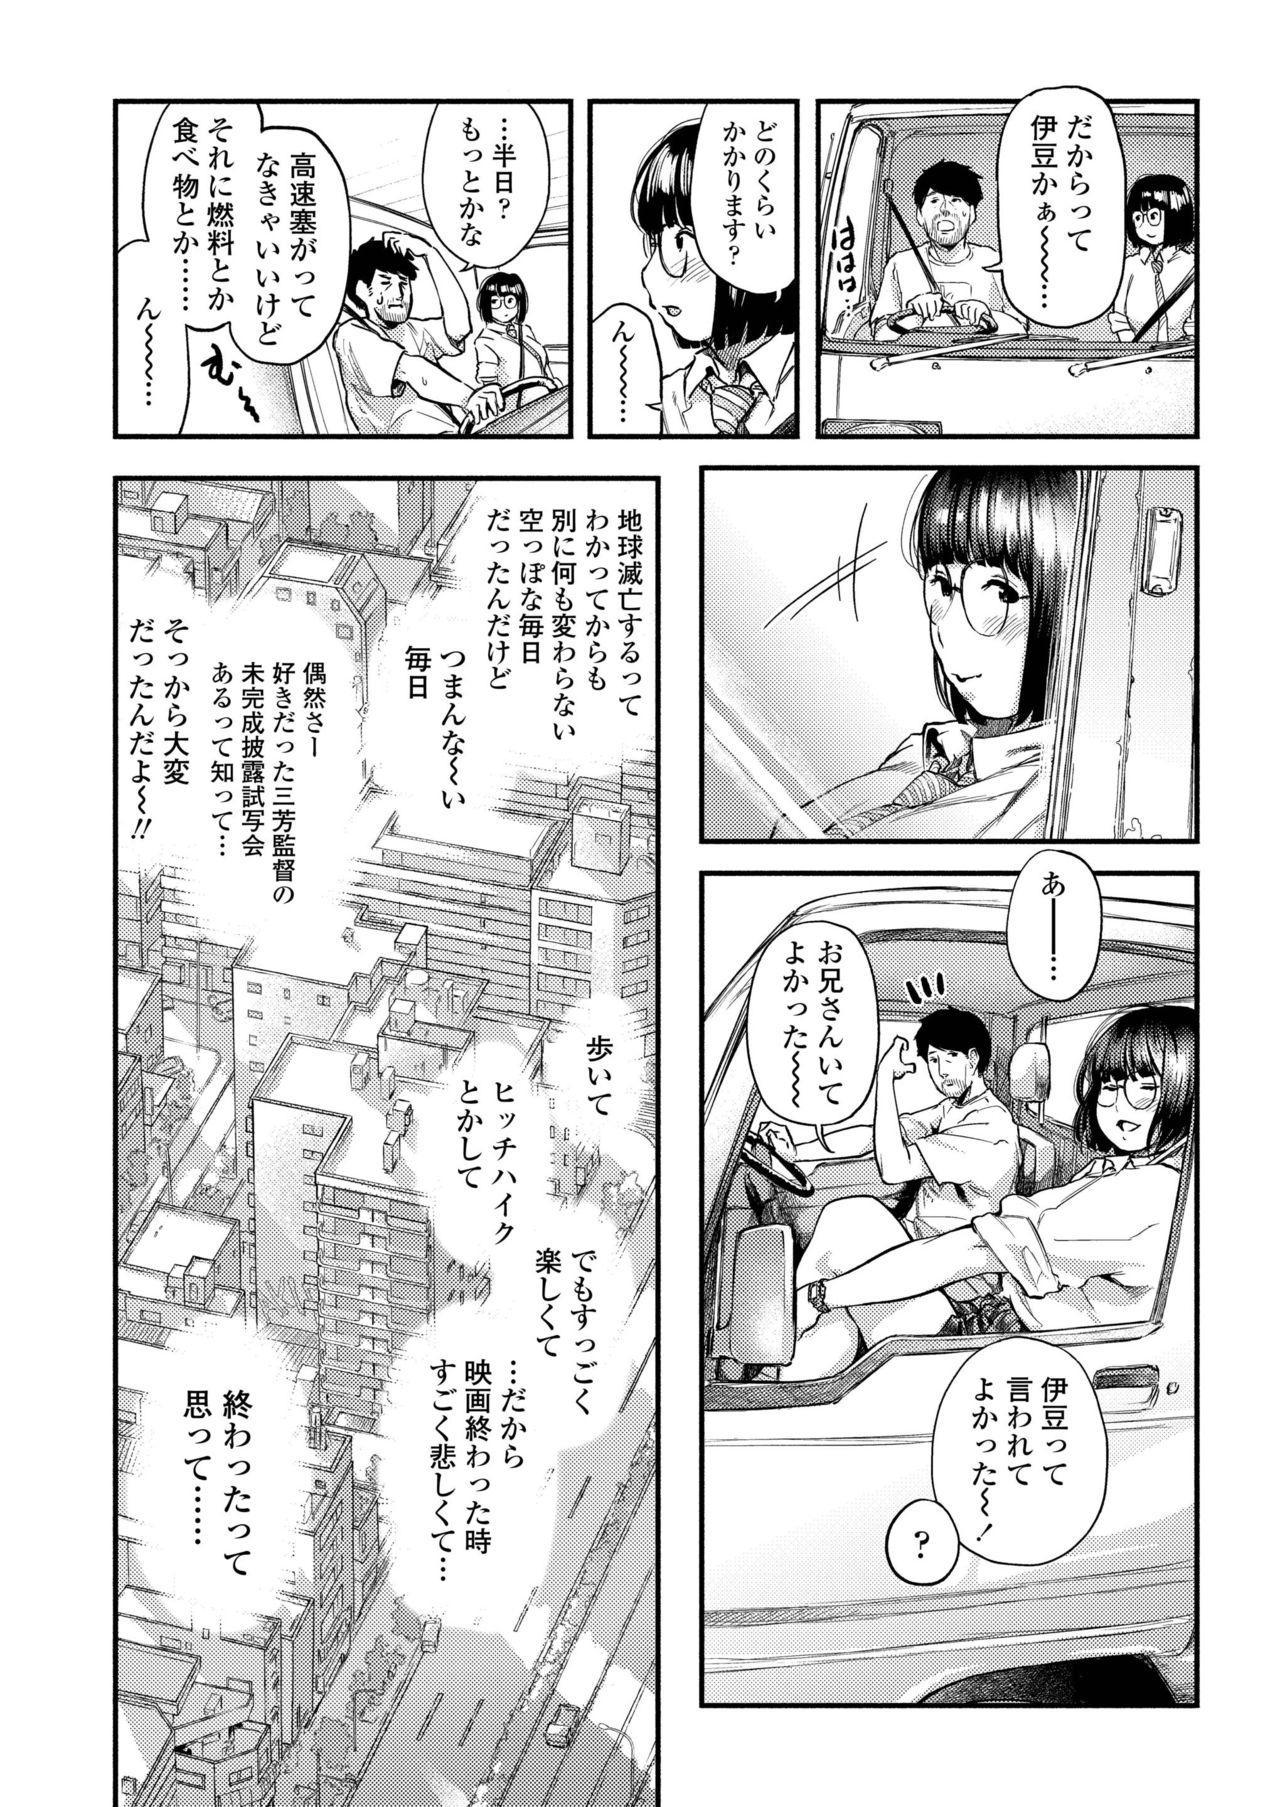 COMIC AOHA 2019 Haru 277